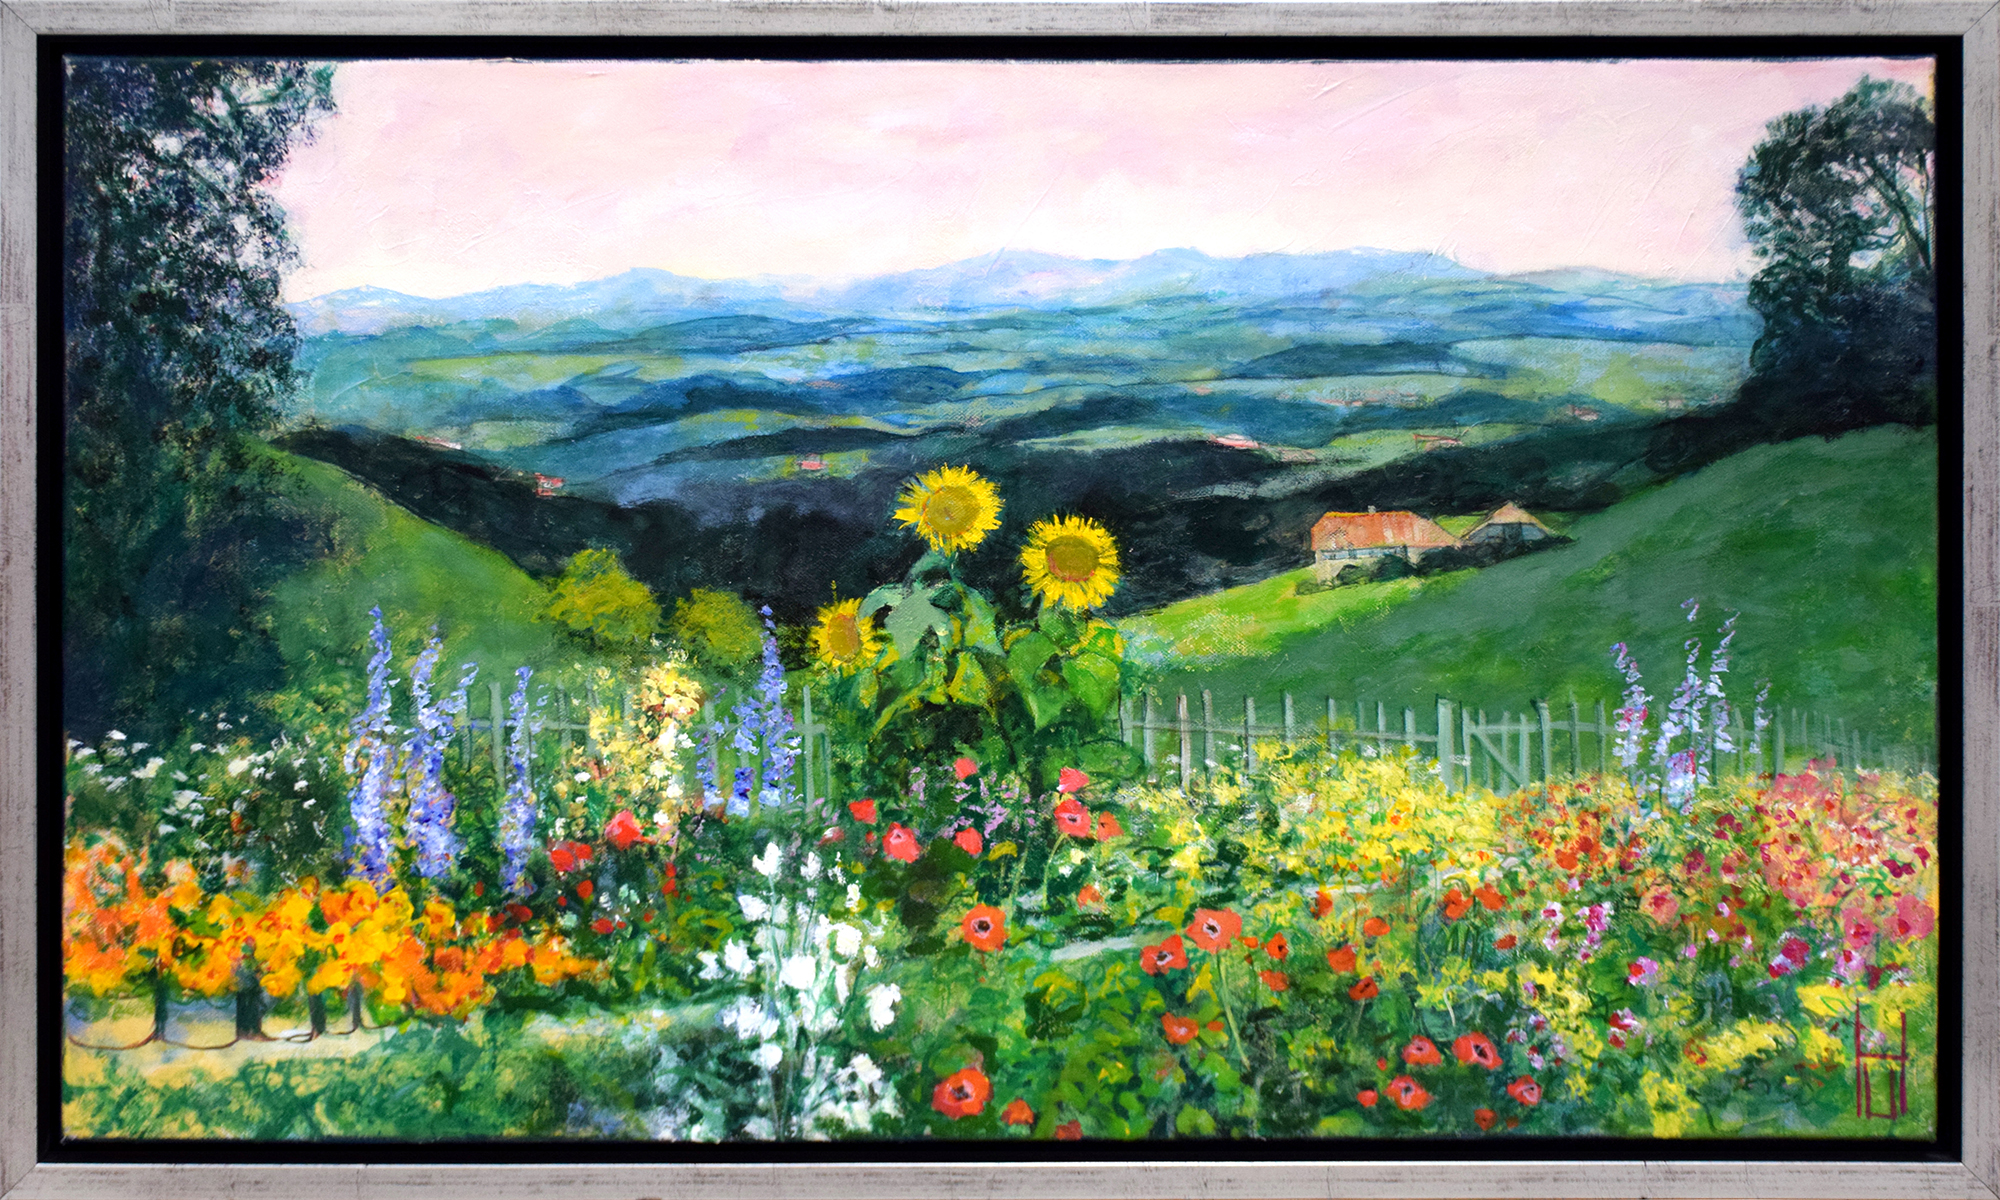 Uwe Herbst - Etude pour Jardin paysan , 0851-006-695